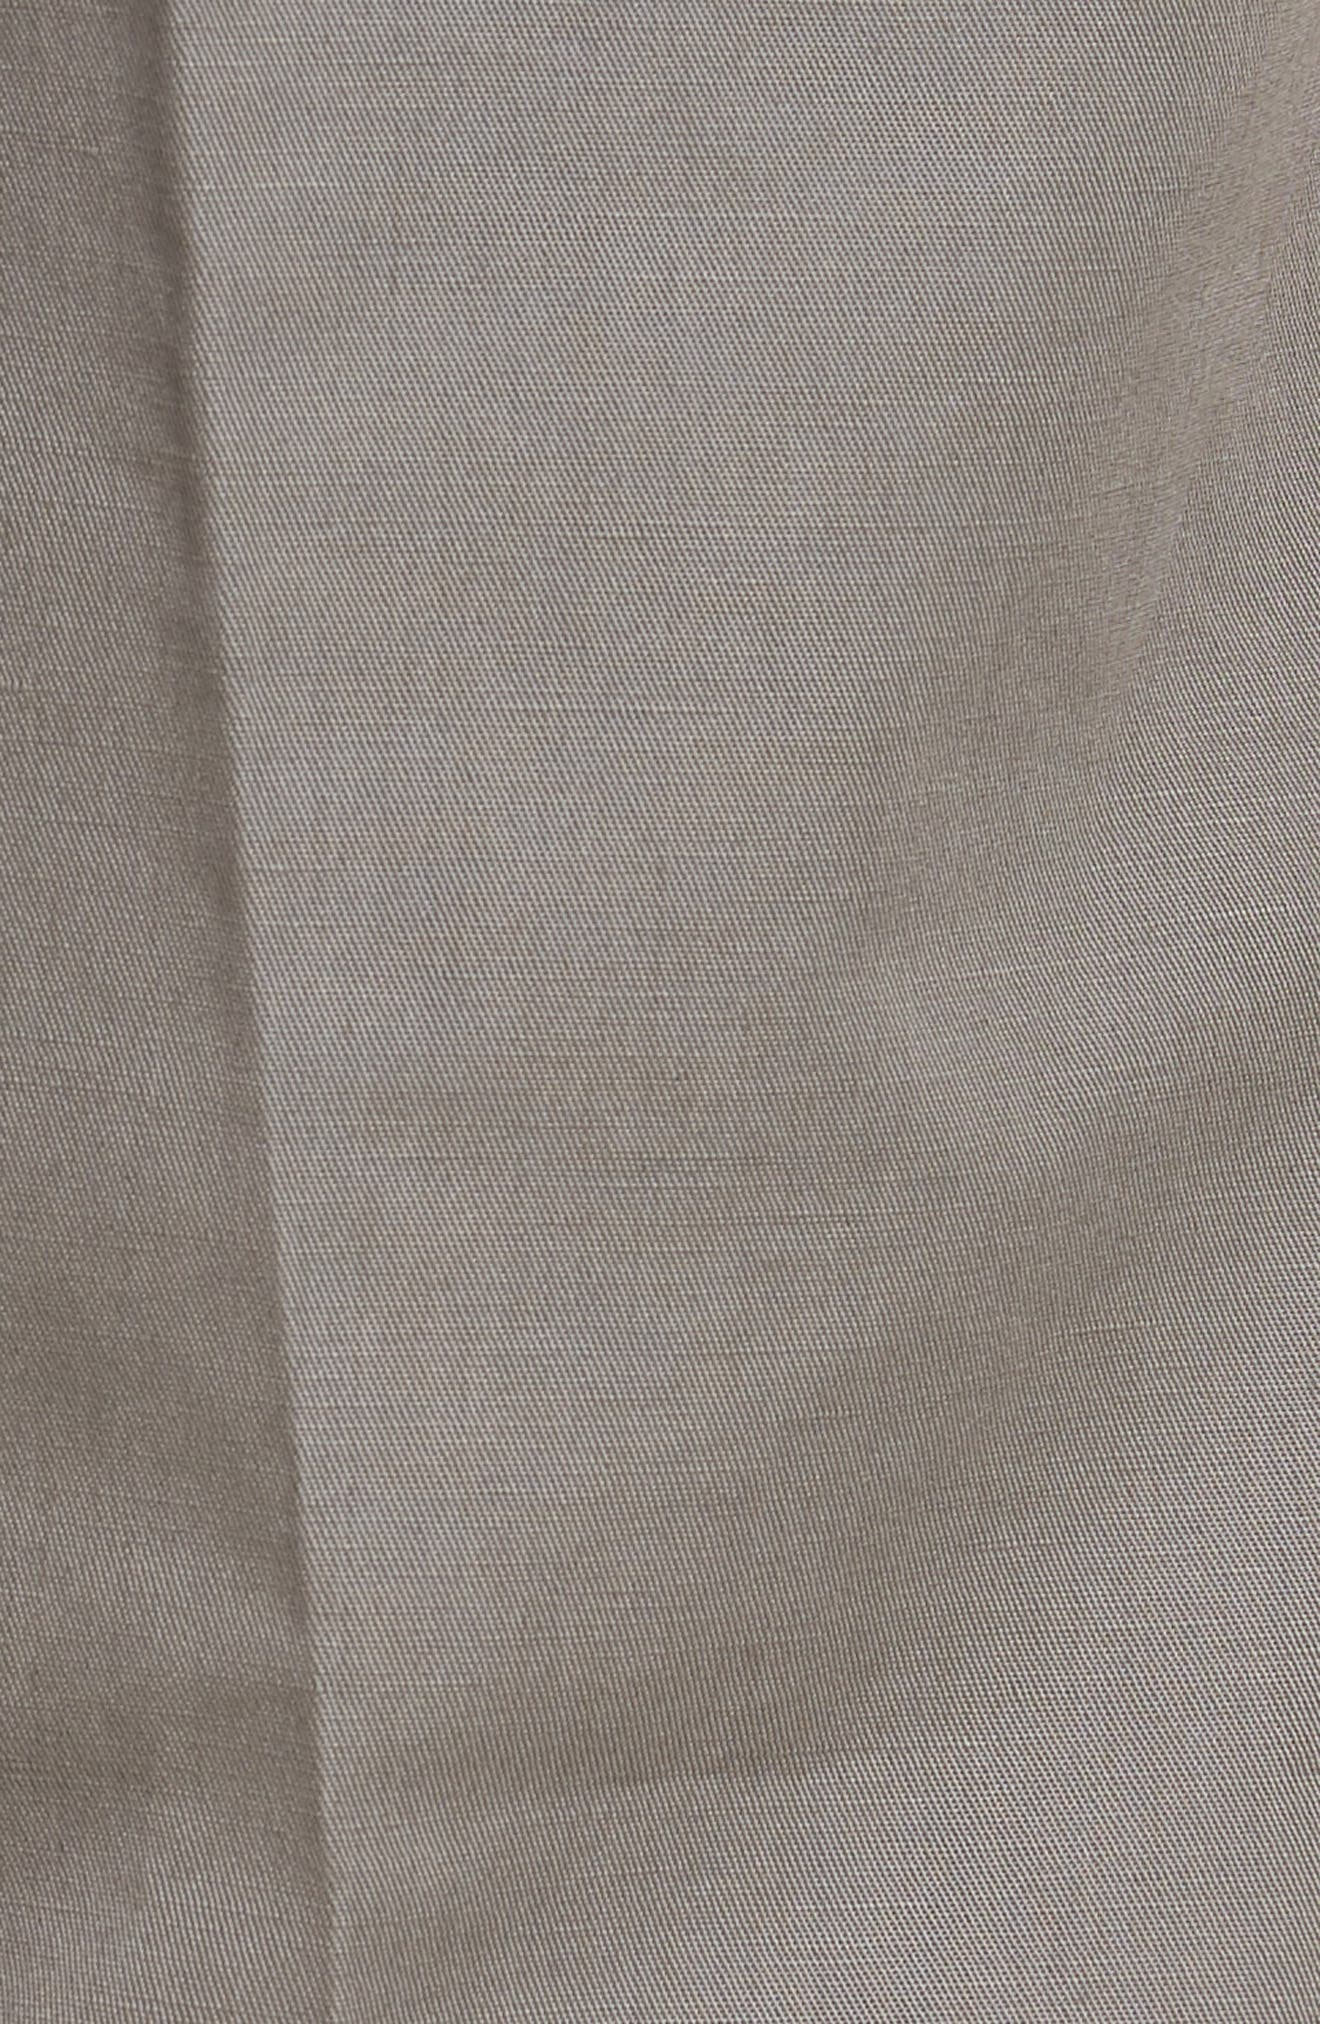 Flat Front Solid Cotton & Linen Trousers,                             Alternate thumbnail 2, color,                             030